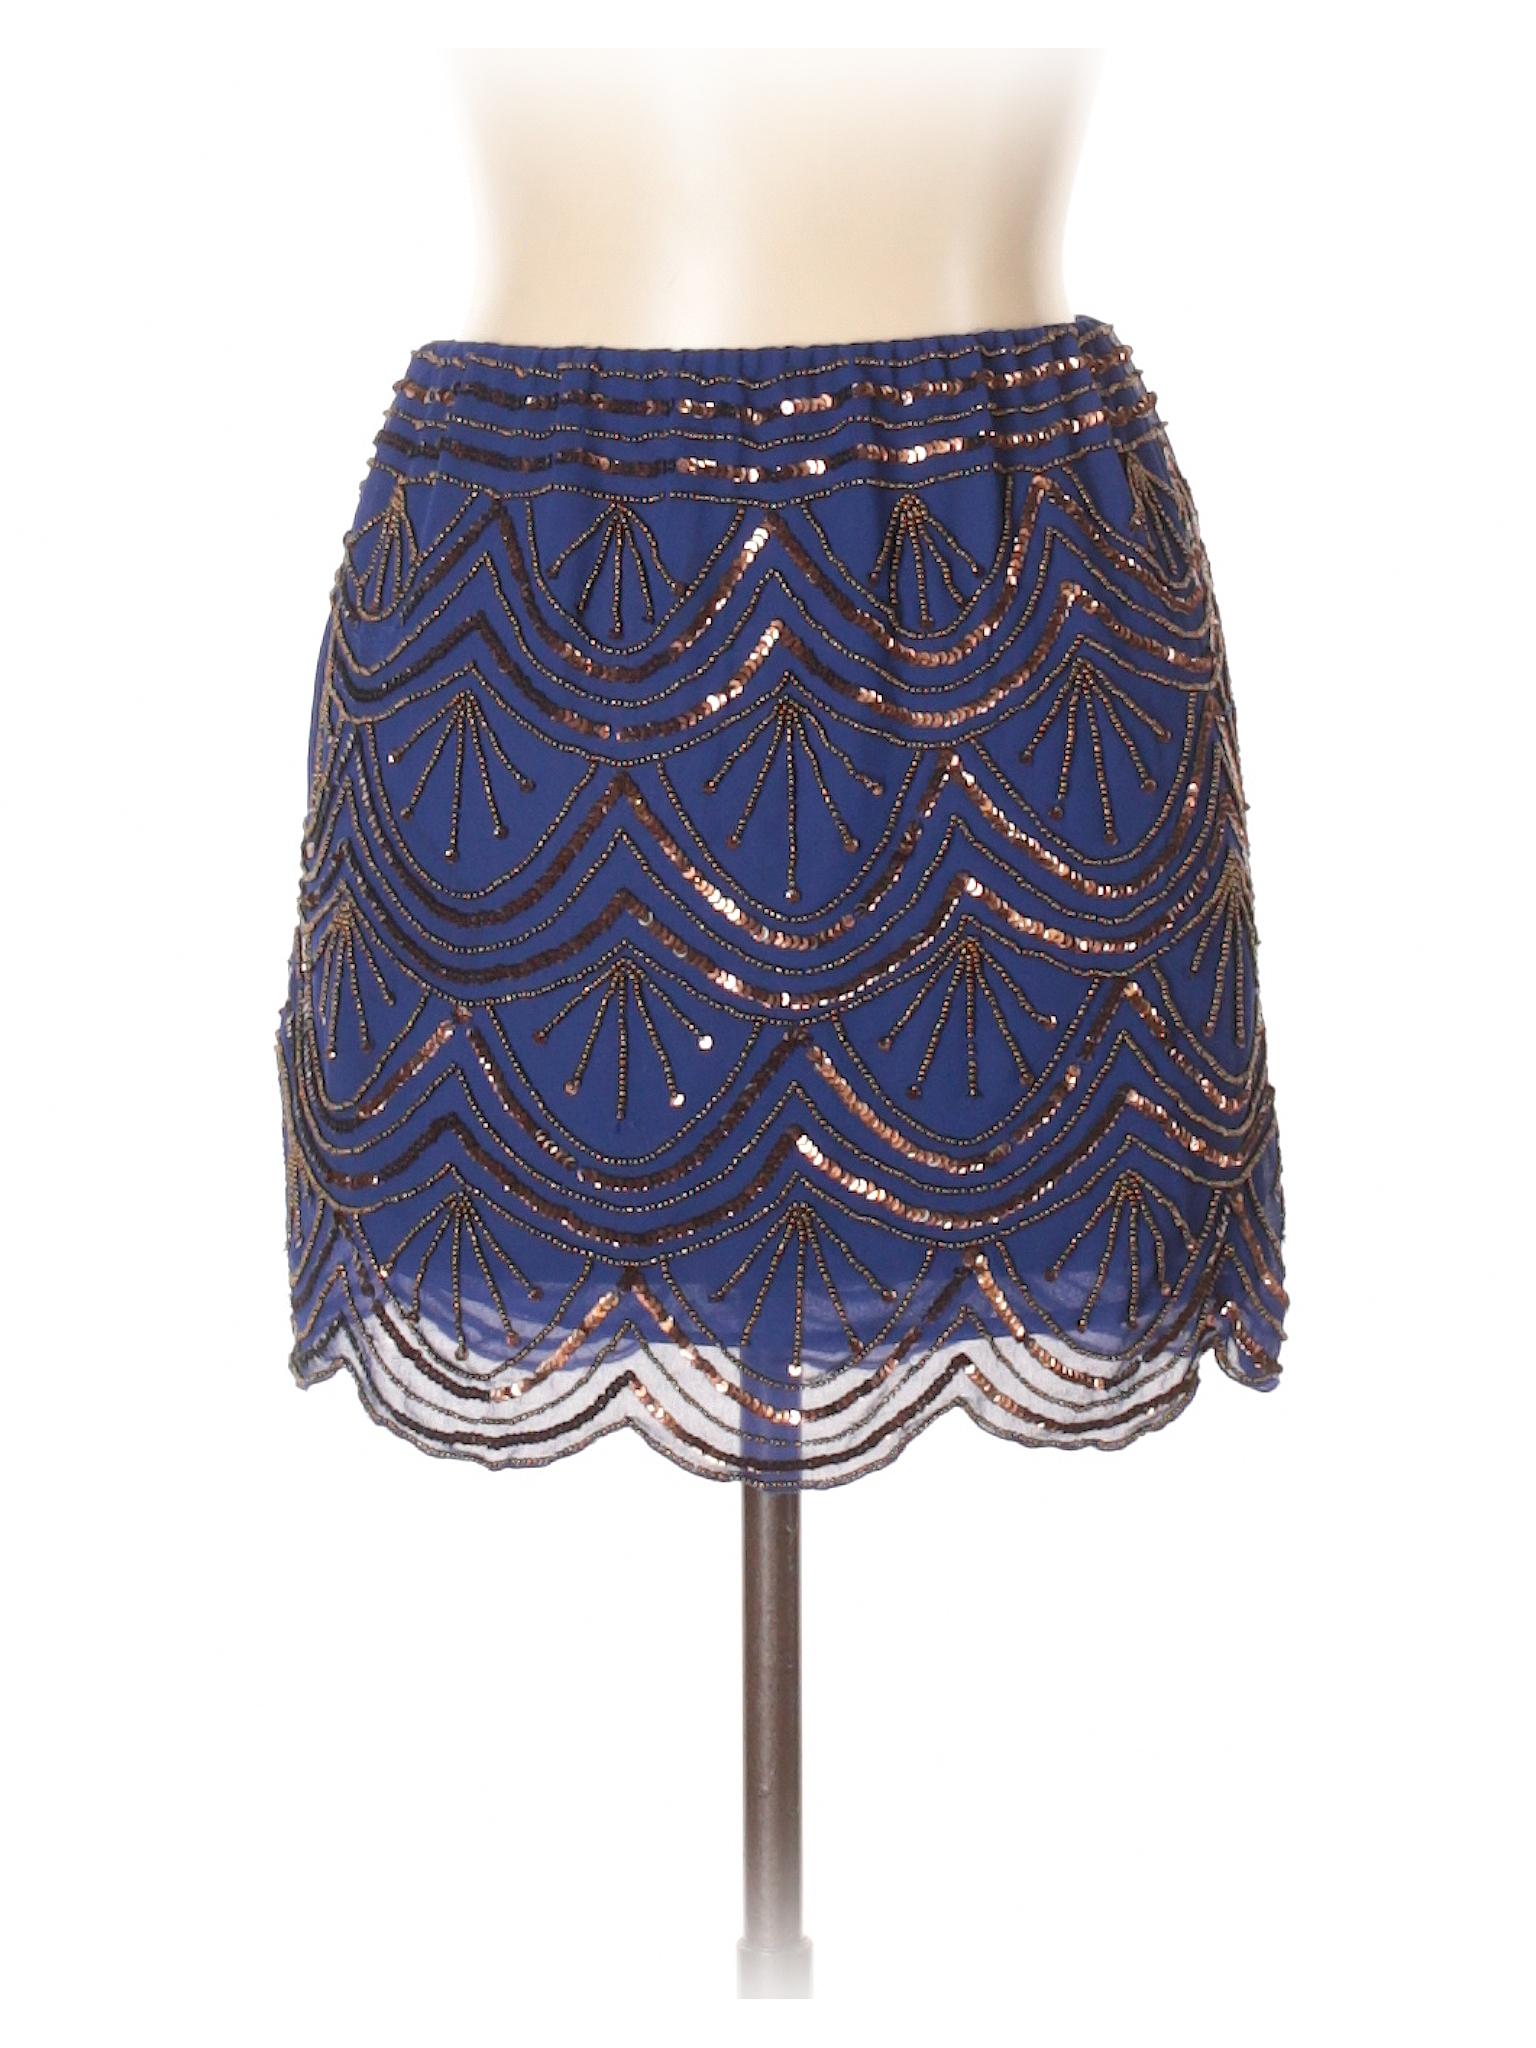 Formal Boutique Skirt Skirt leisure Boutique Formal Hazel leisure Hazel xZq6HF1